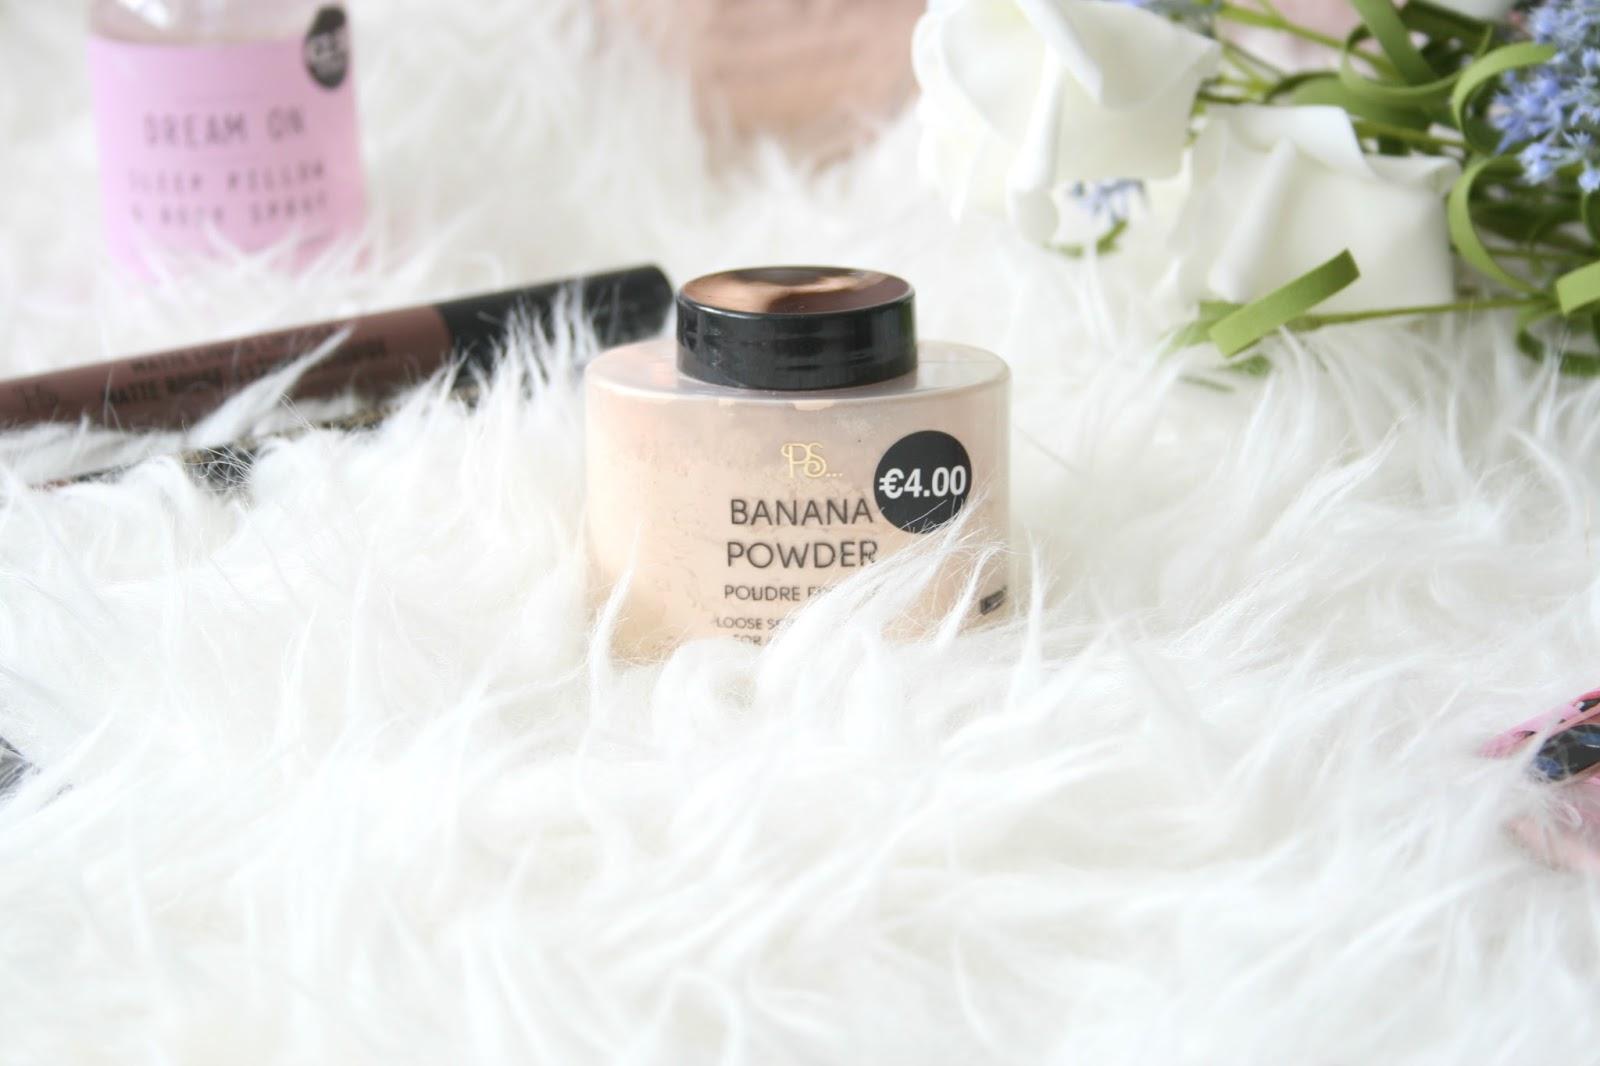 Primark Banana Powder